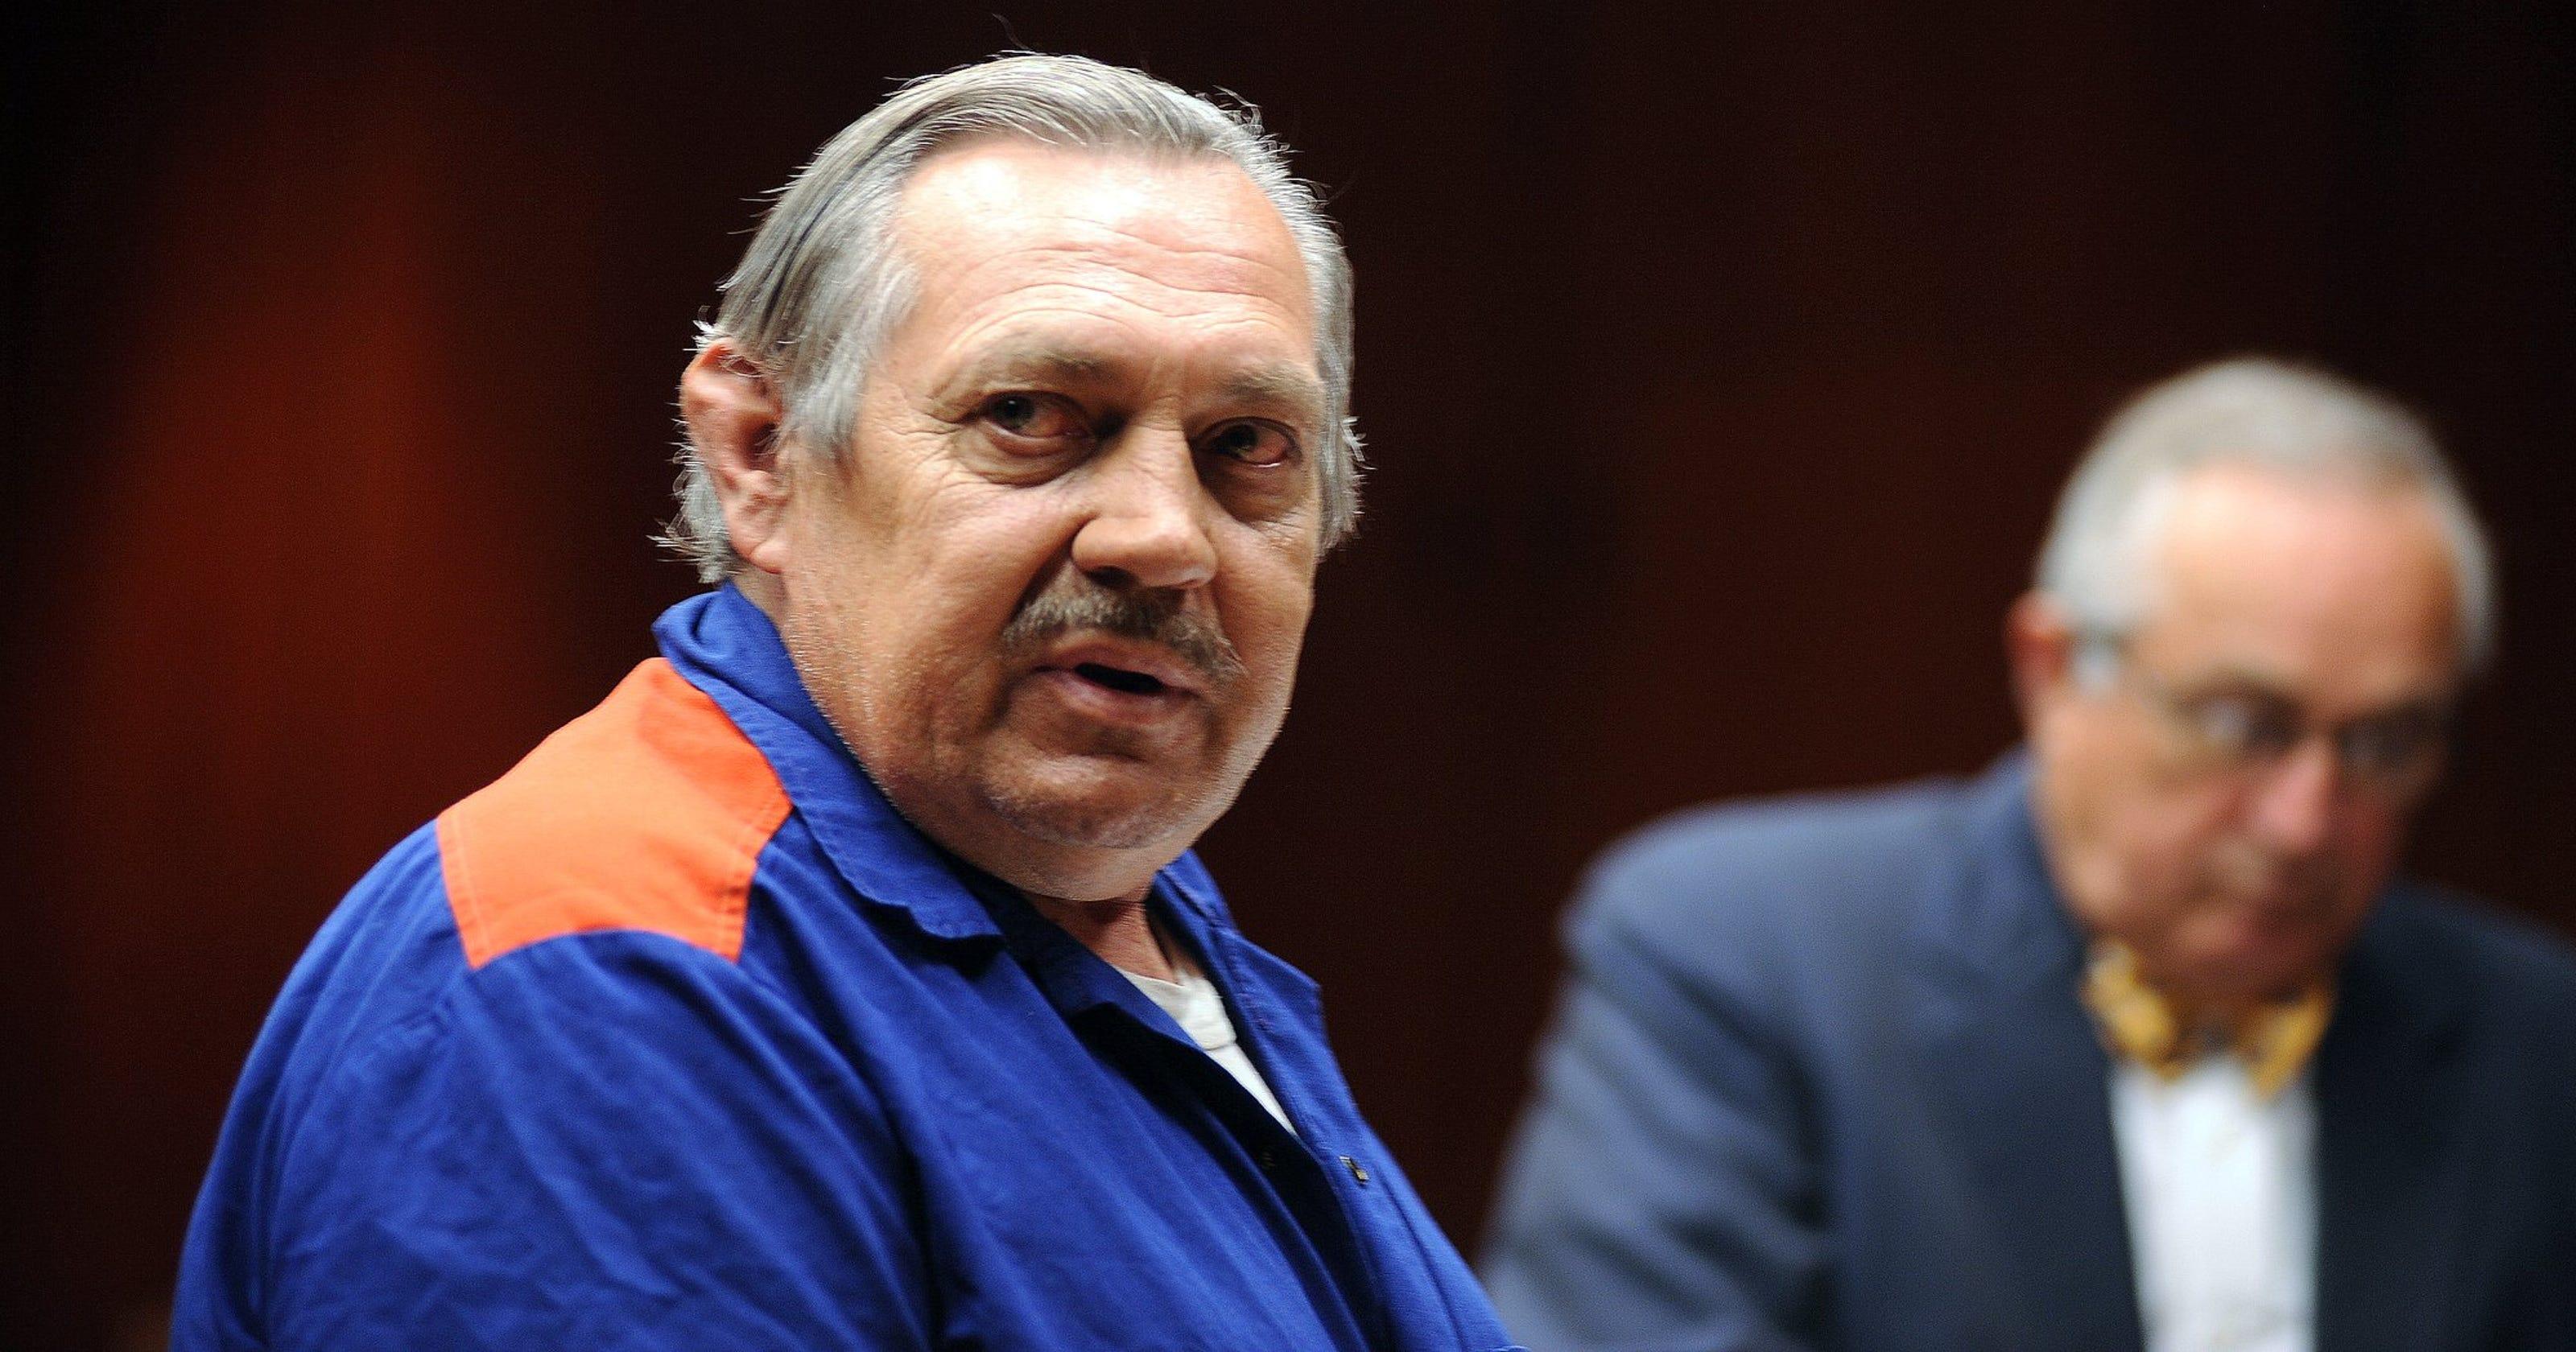 Police say suspected serial killer Arthur Ream boasted of